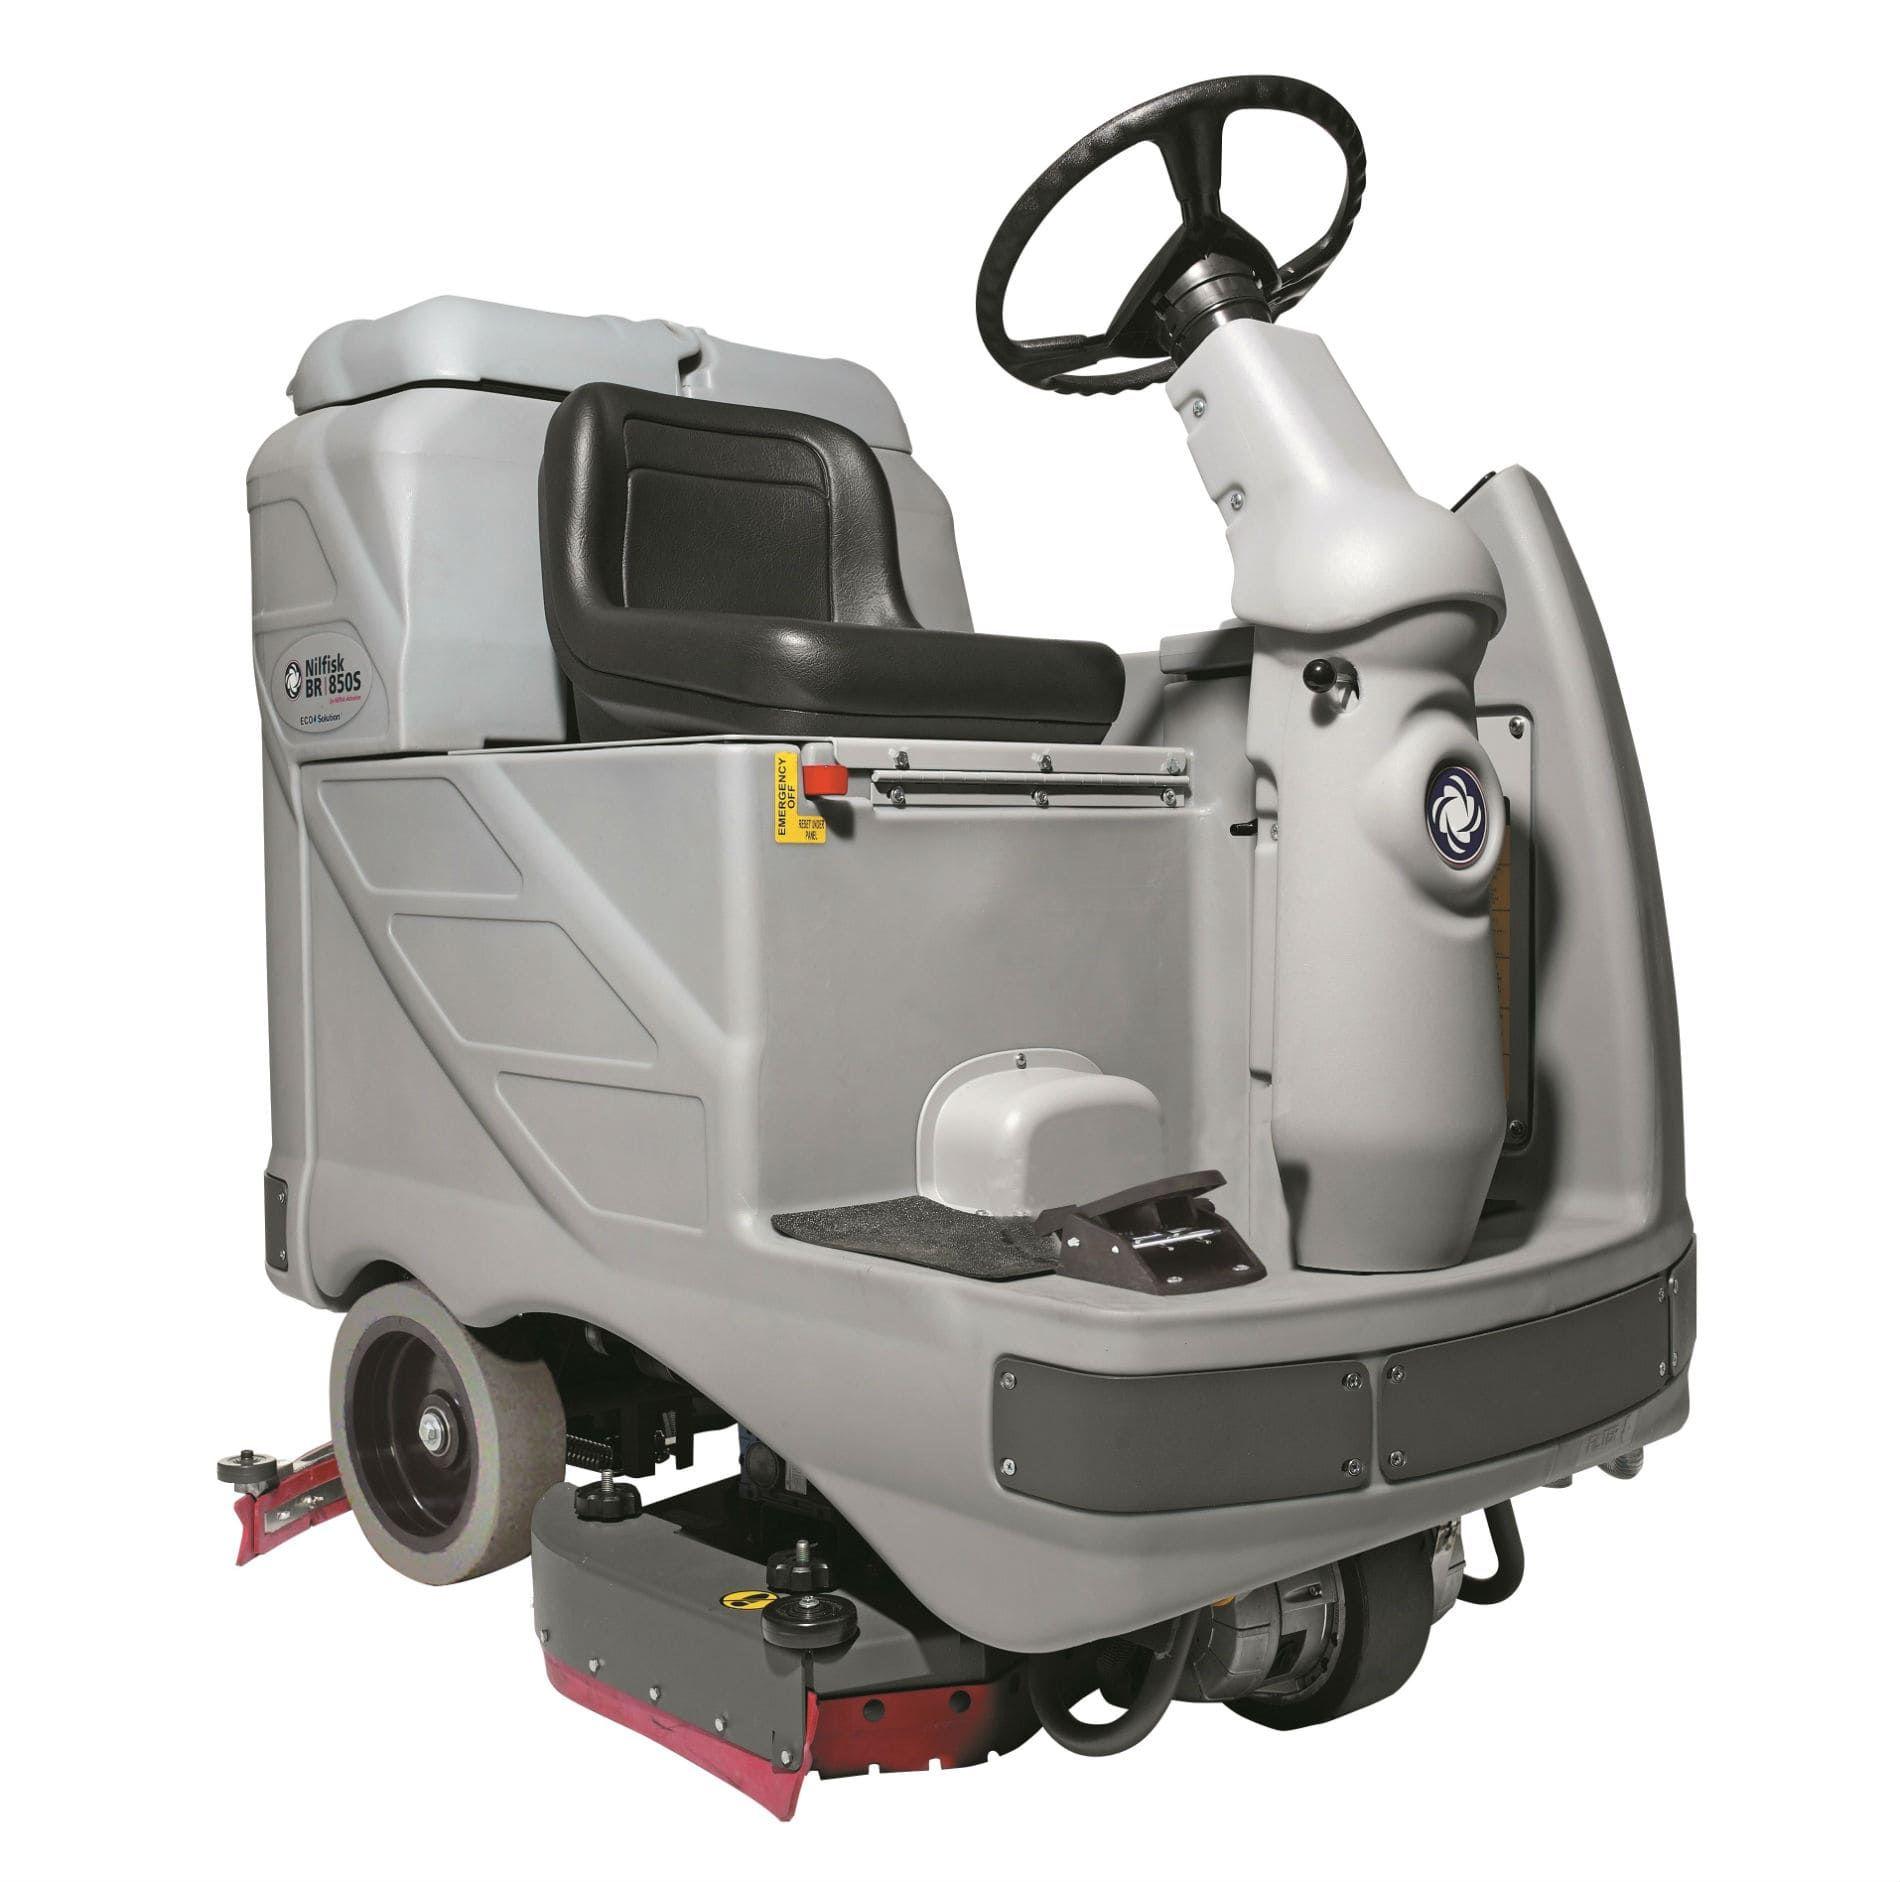 Nilfisk BR850 Scrubber Dryer